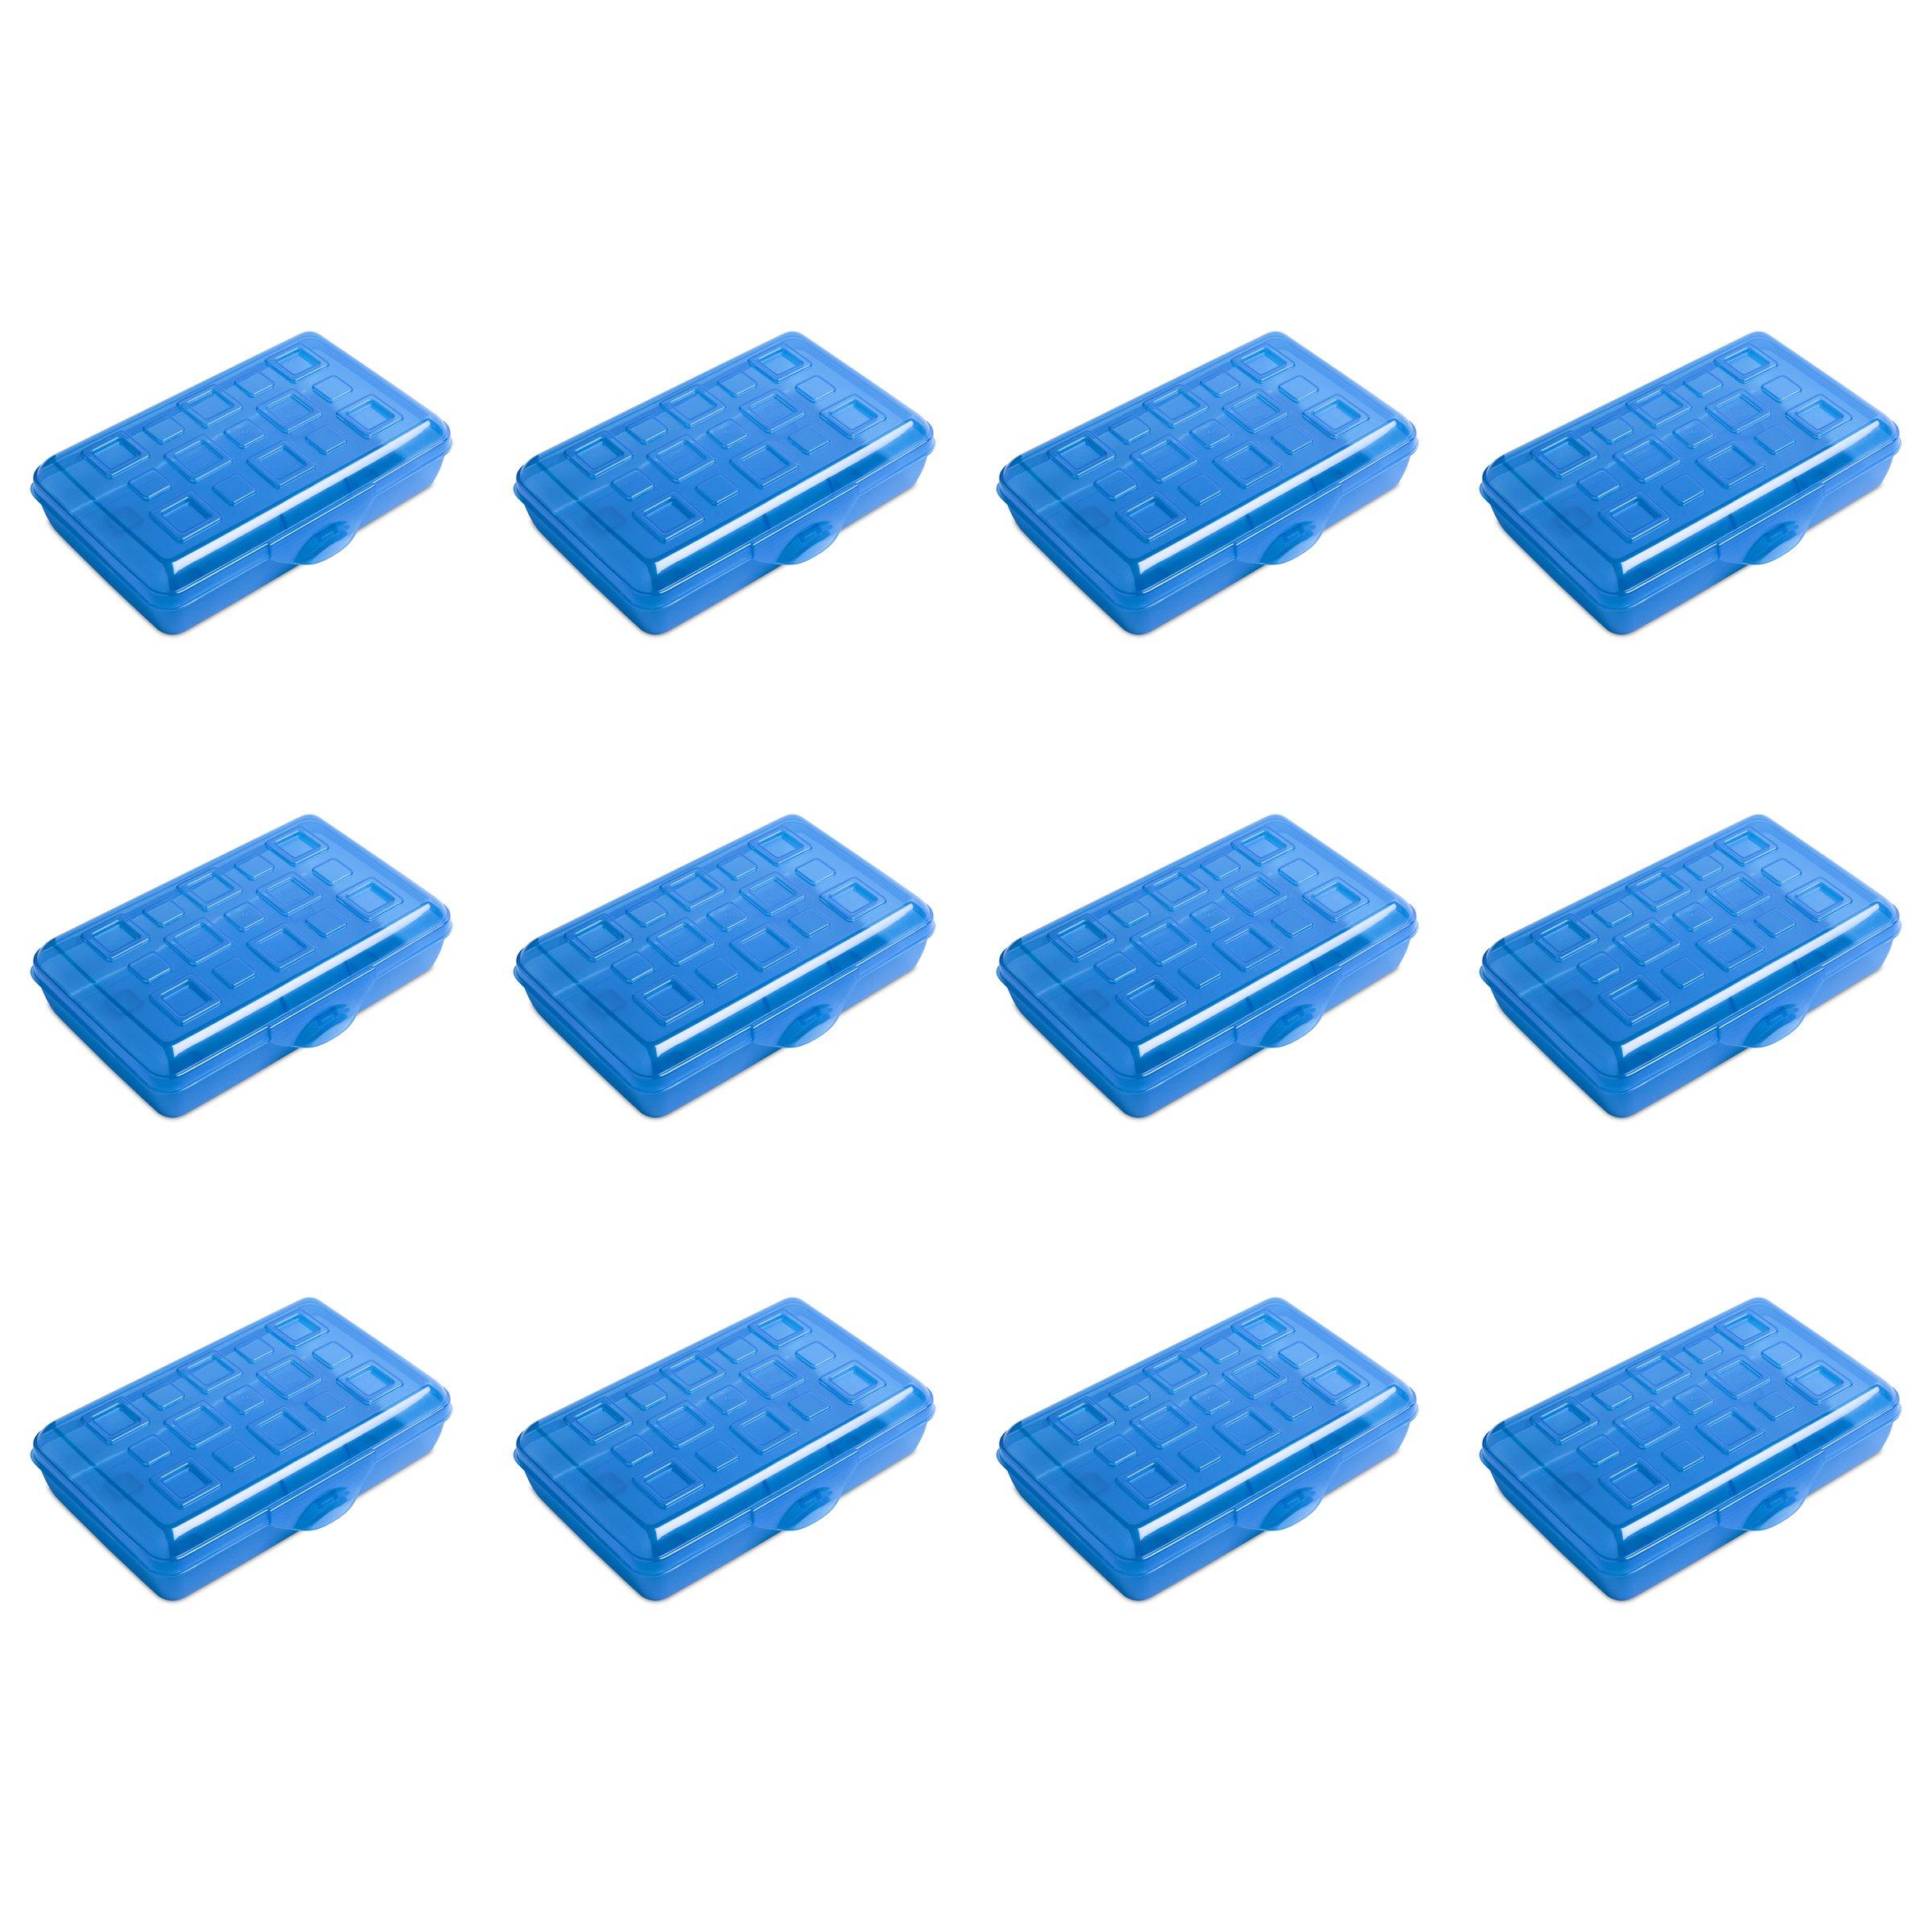 Sterilite 17224812 Small Pencil Box, Splash Tint, 12-Pack by STERILITE